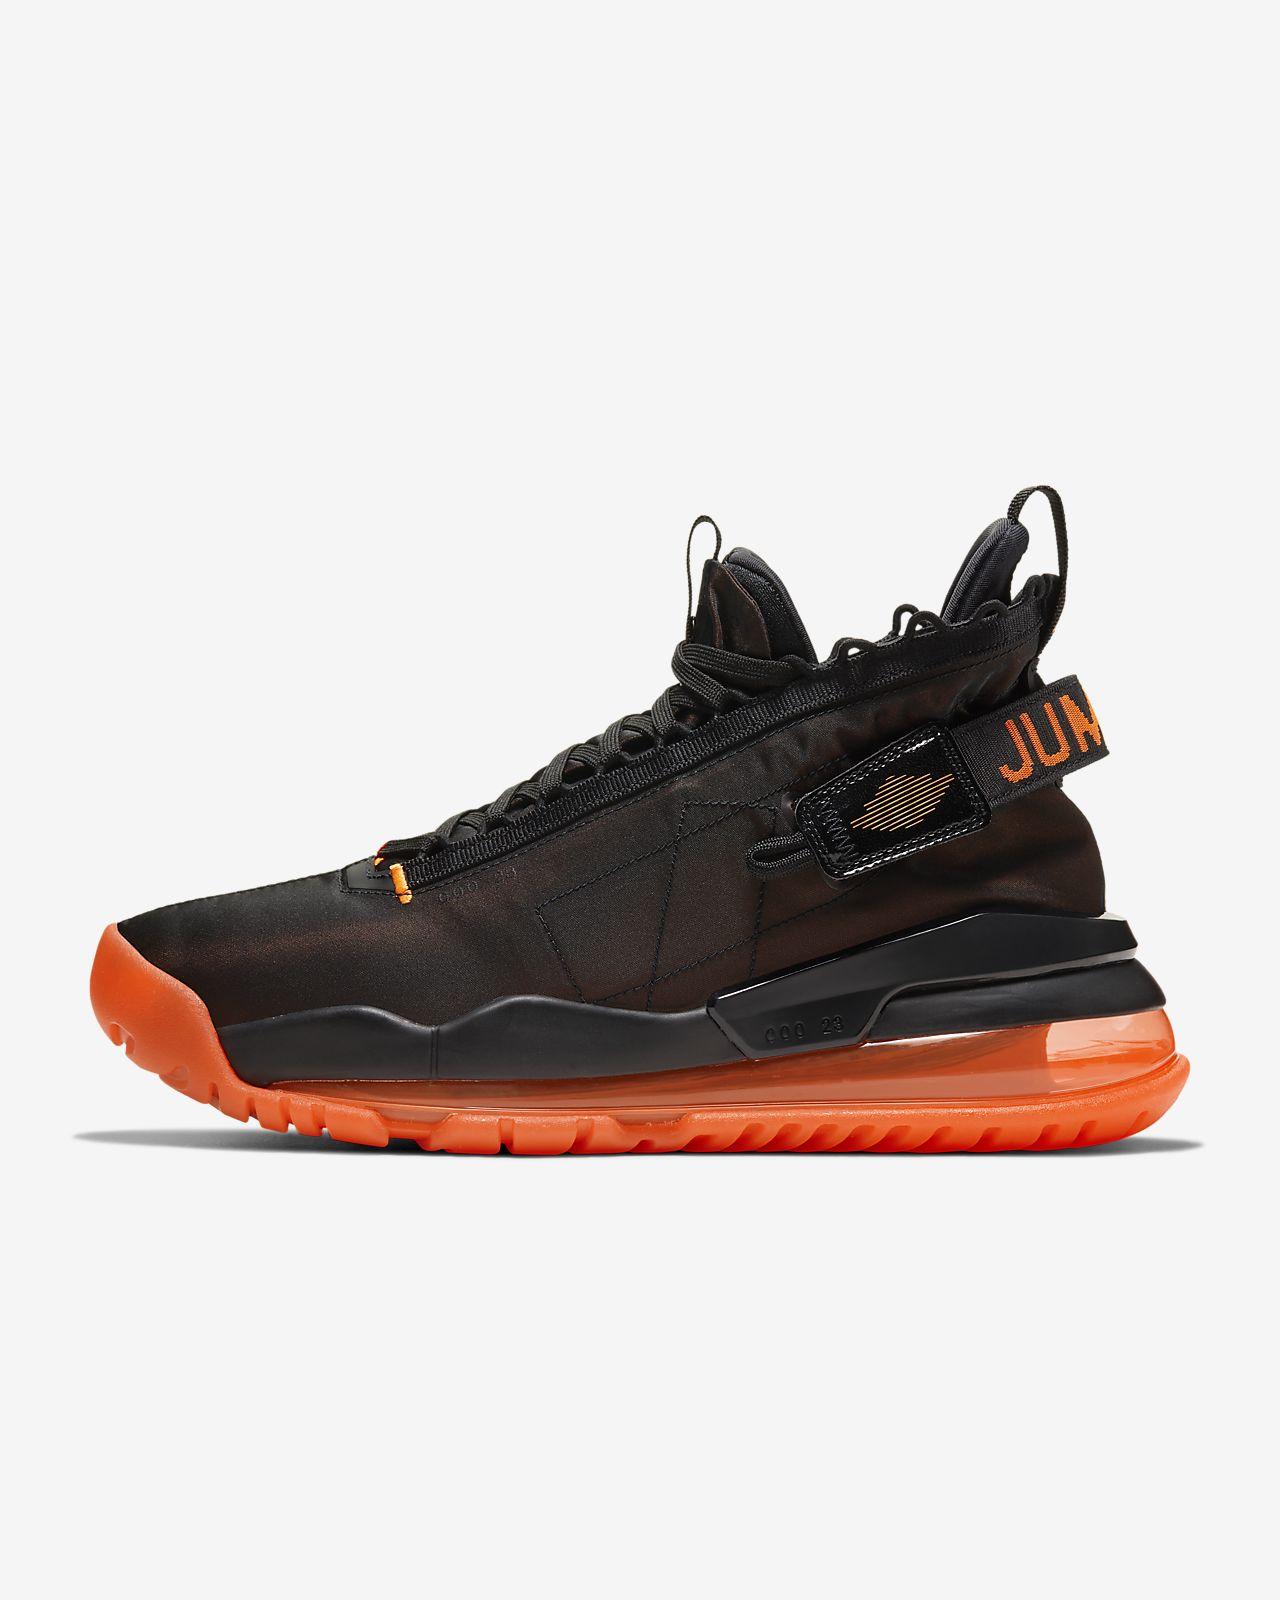 Mænd Nike Air Huarache Ultra Blå Orange Sko